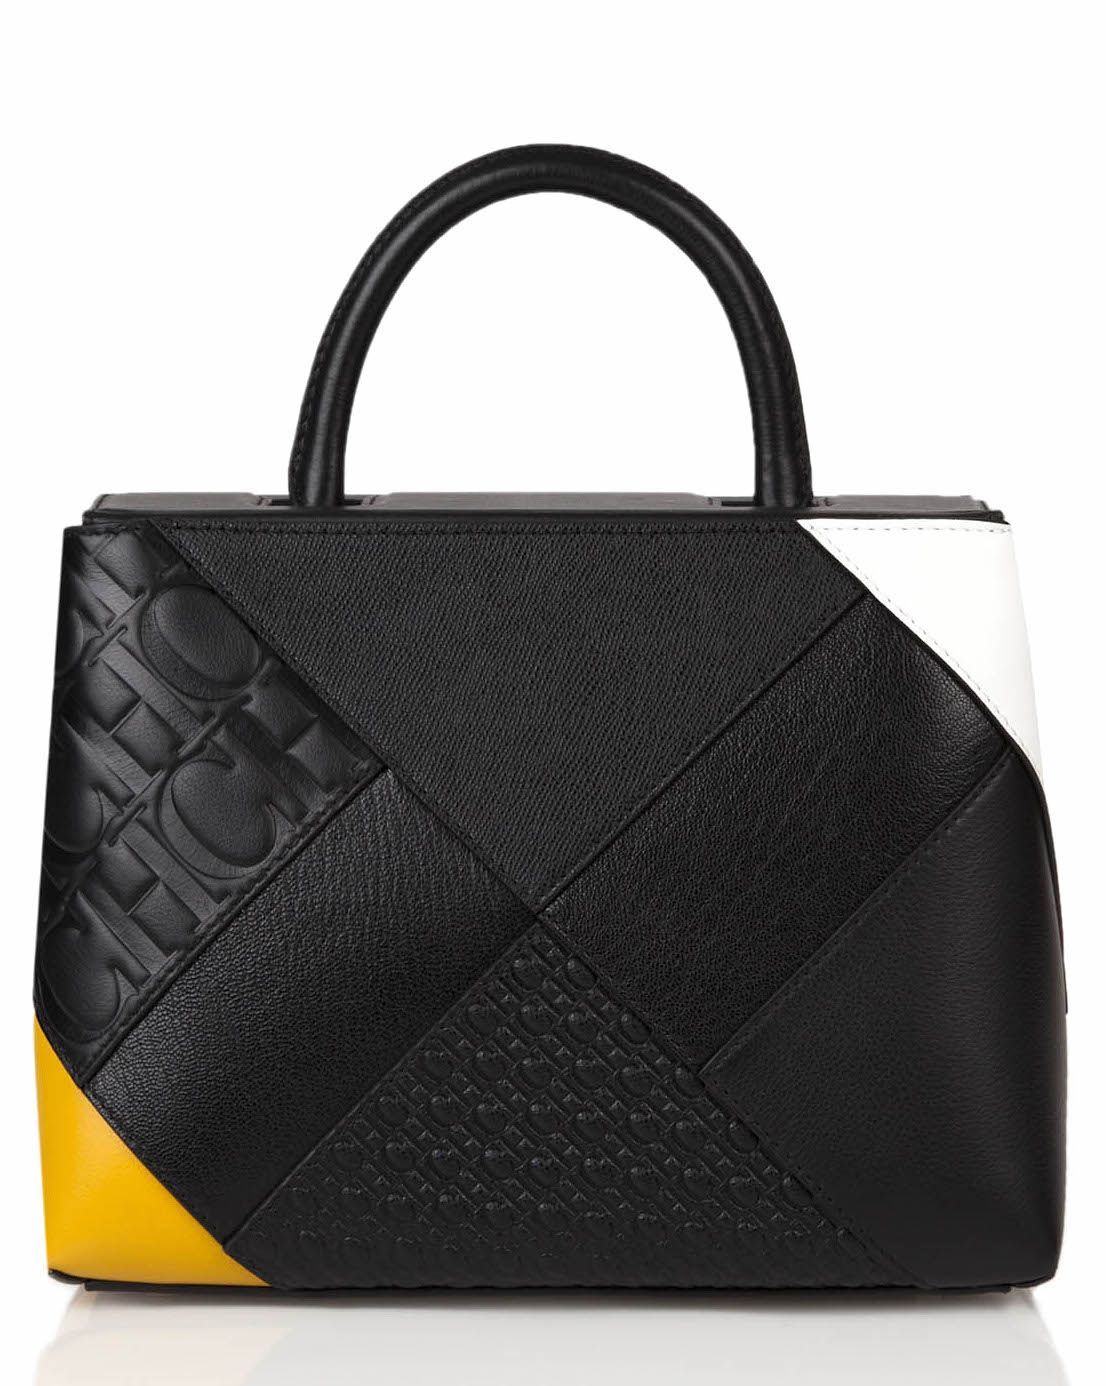 4c100201855df Carolina Herrera Spring 2016 superb handbag. | bags | Bags, Leather ...